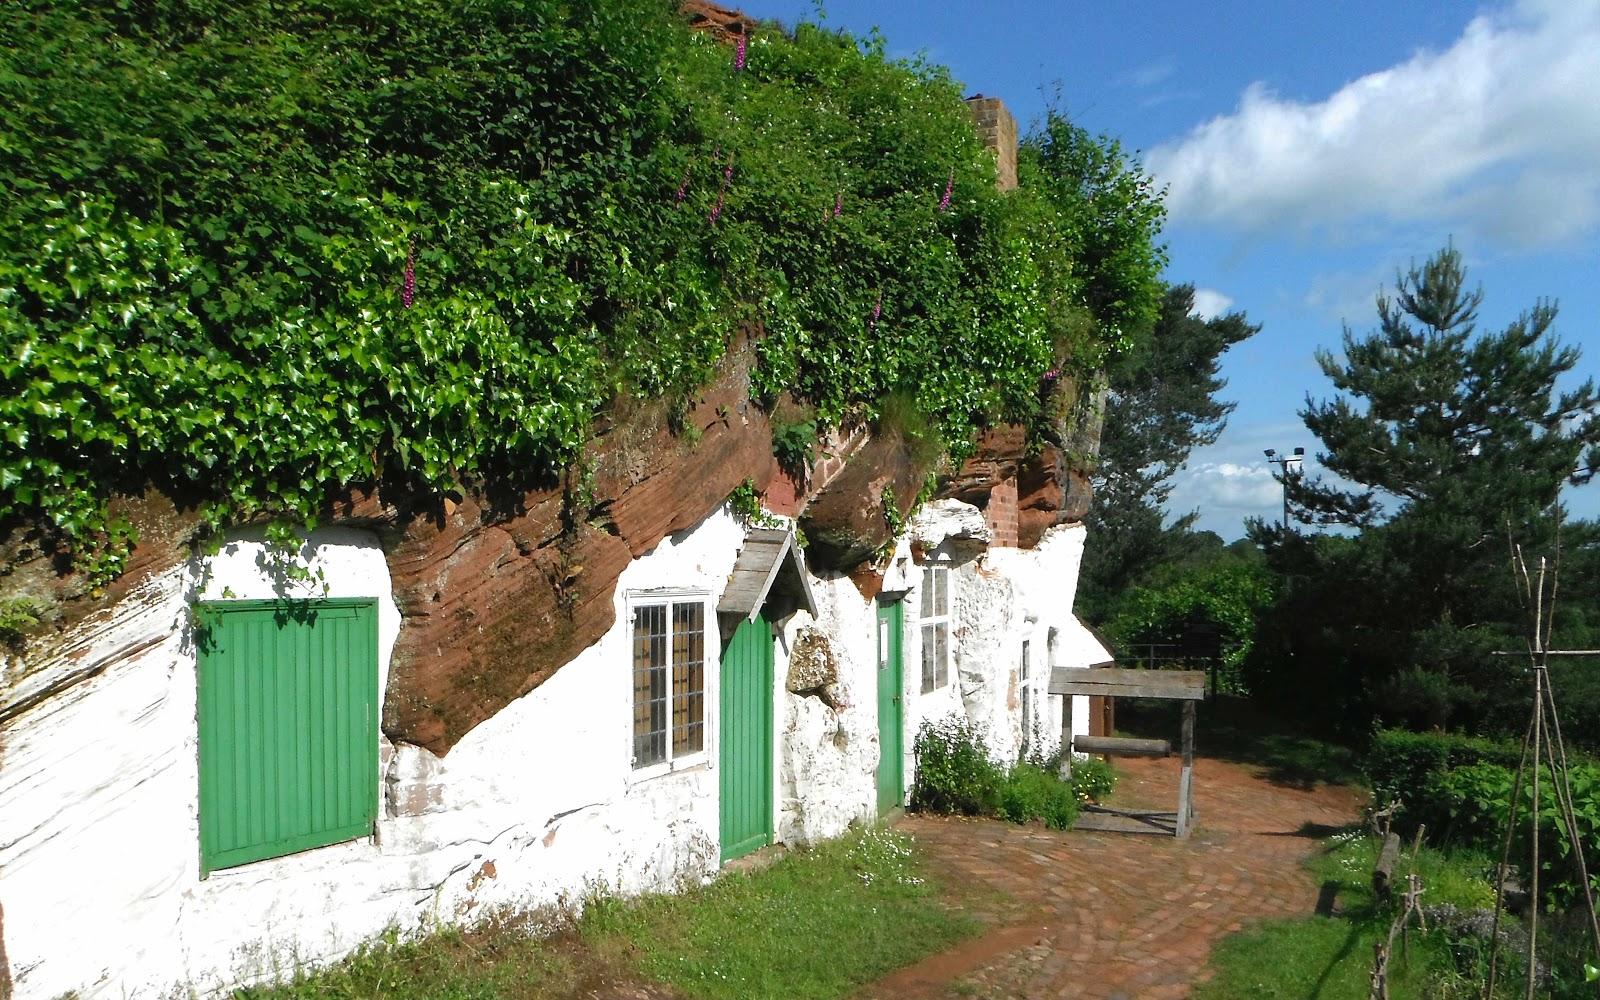 Rock Houses on Kinver Edge